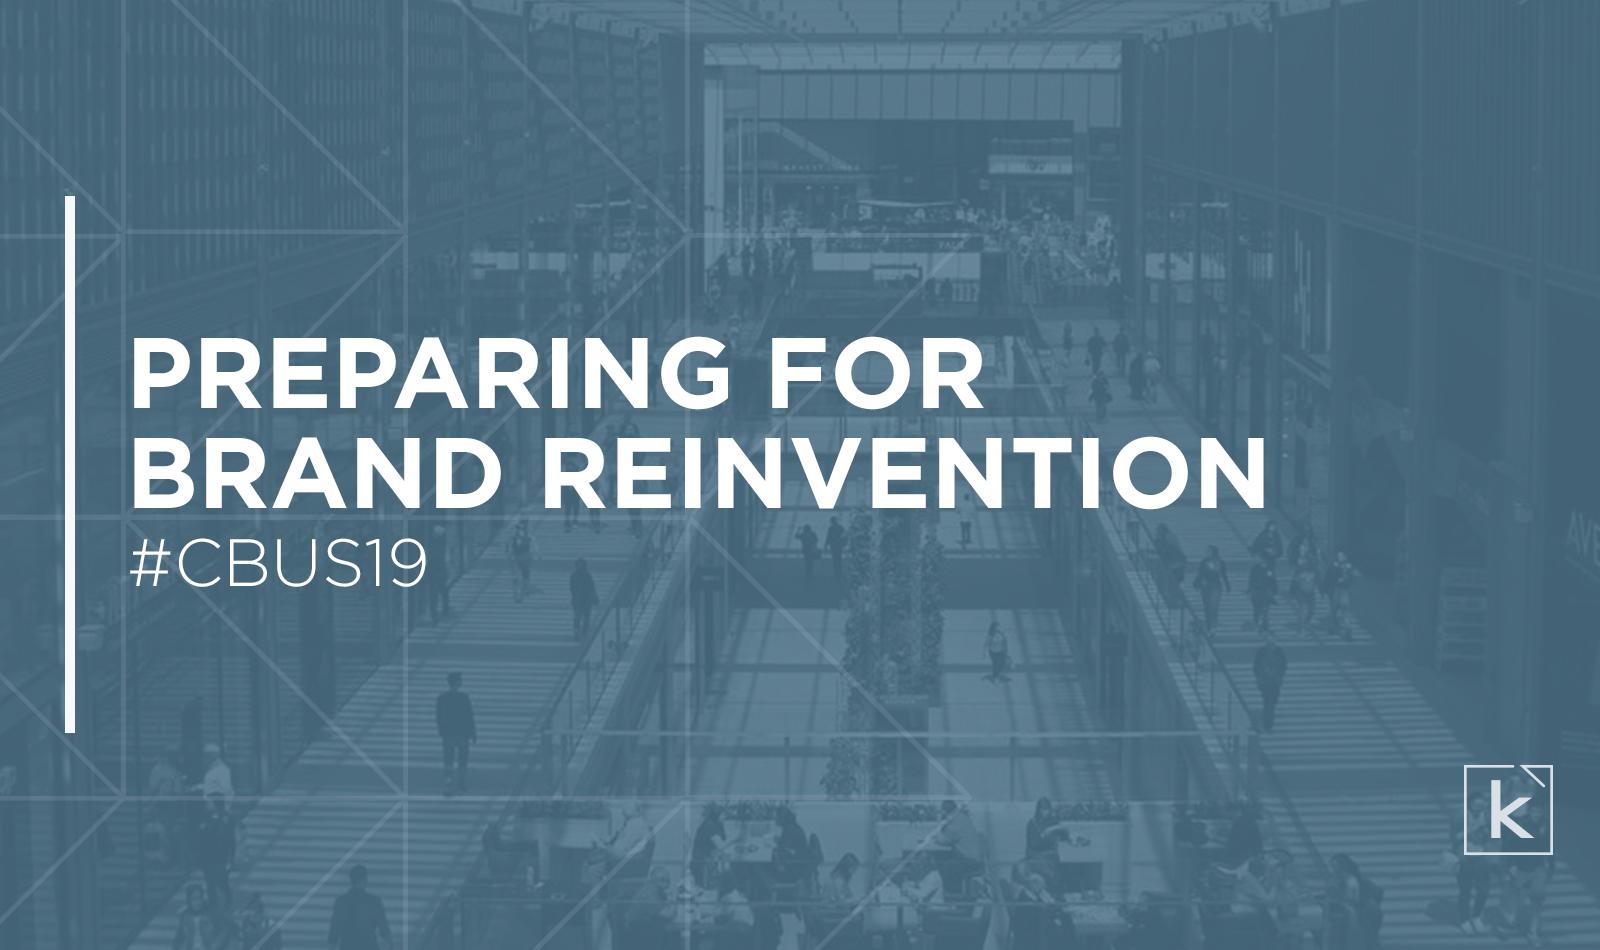 lane-bryant-preparing-for-brand-reinvention